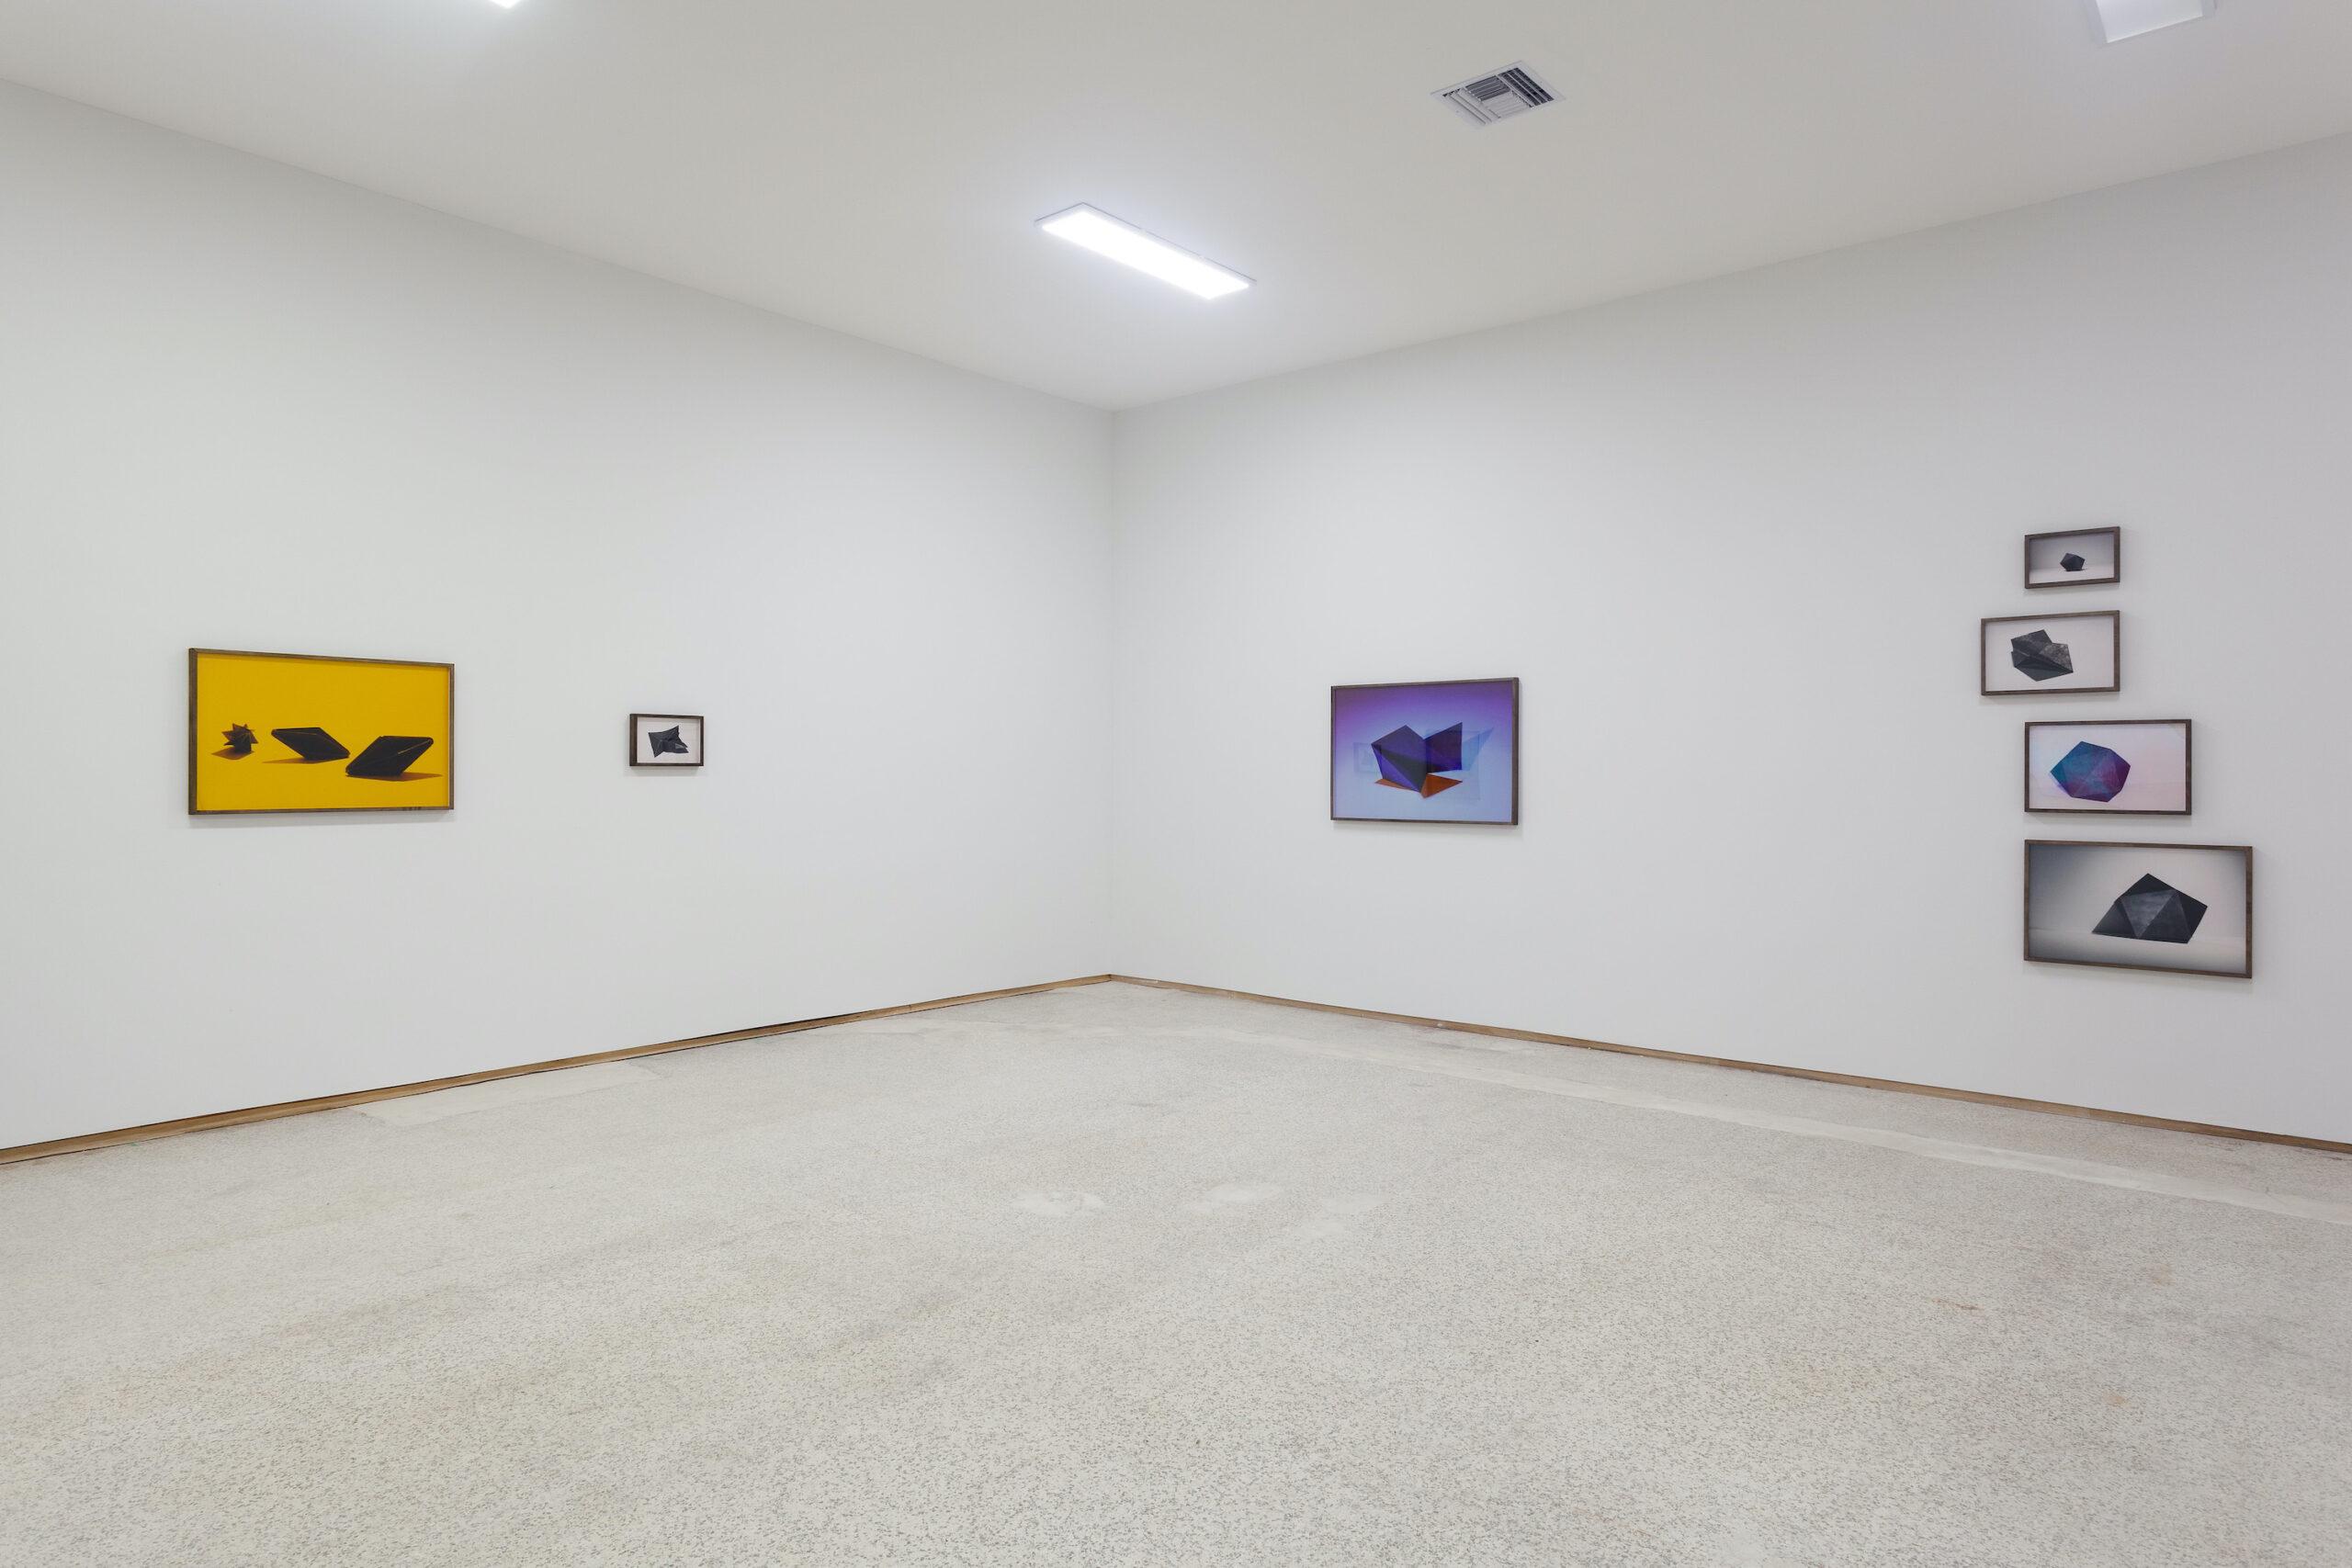 Felecia Chizuko Carlisle, Patterns of Interference (installation view), 2021